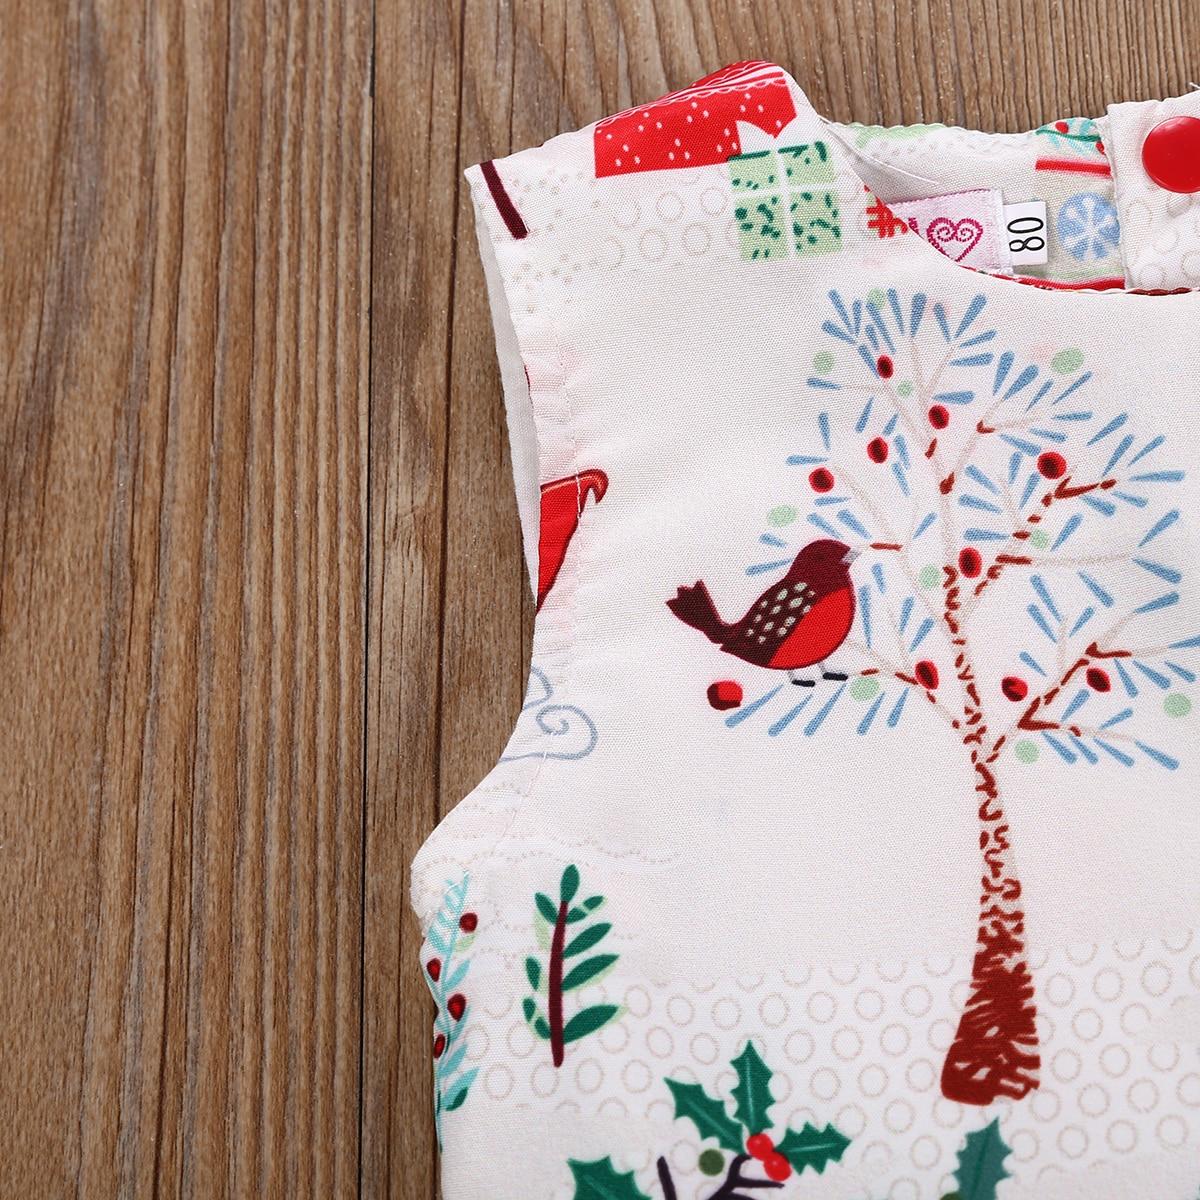 f008d15c4 2-6 Years Xmas Toddler Kid Baby Girl Christmas Cartoon Deer Sleeveless  Party Dress 2